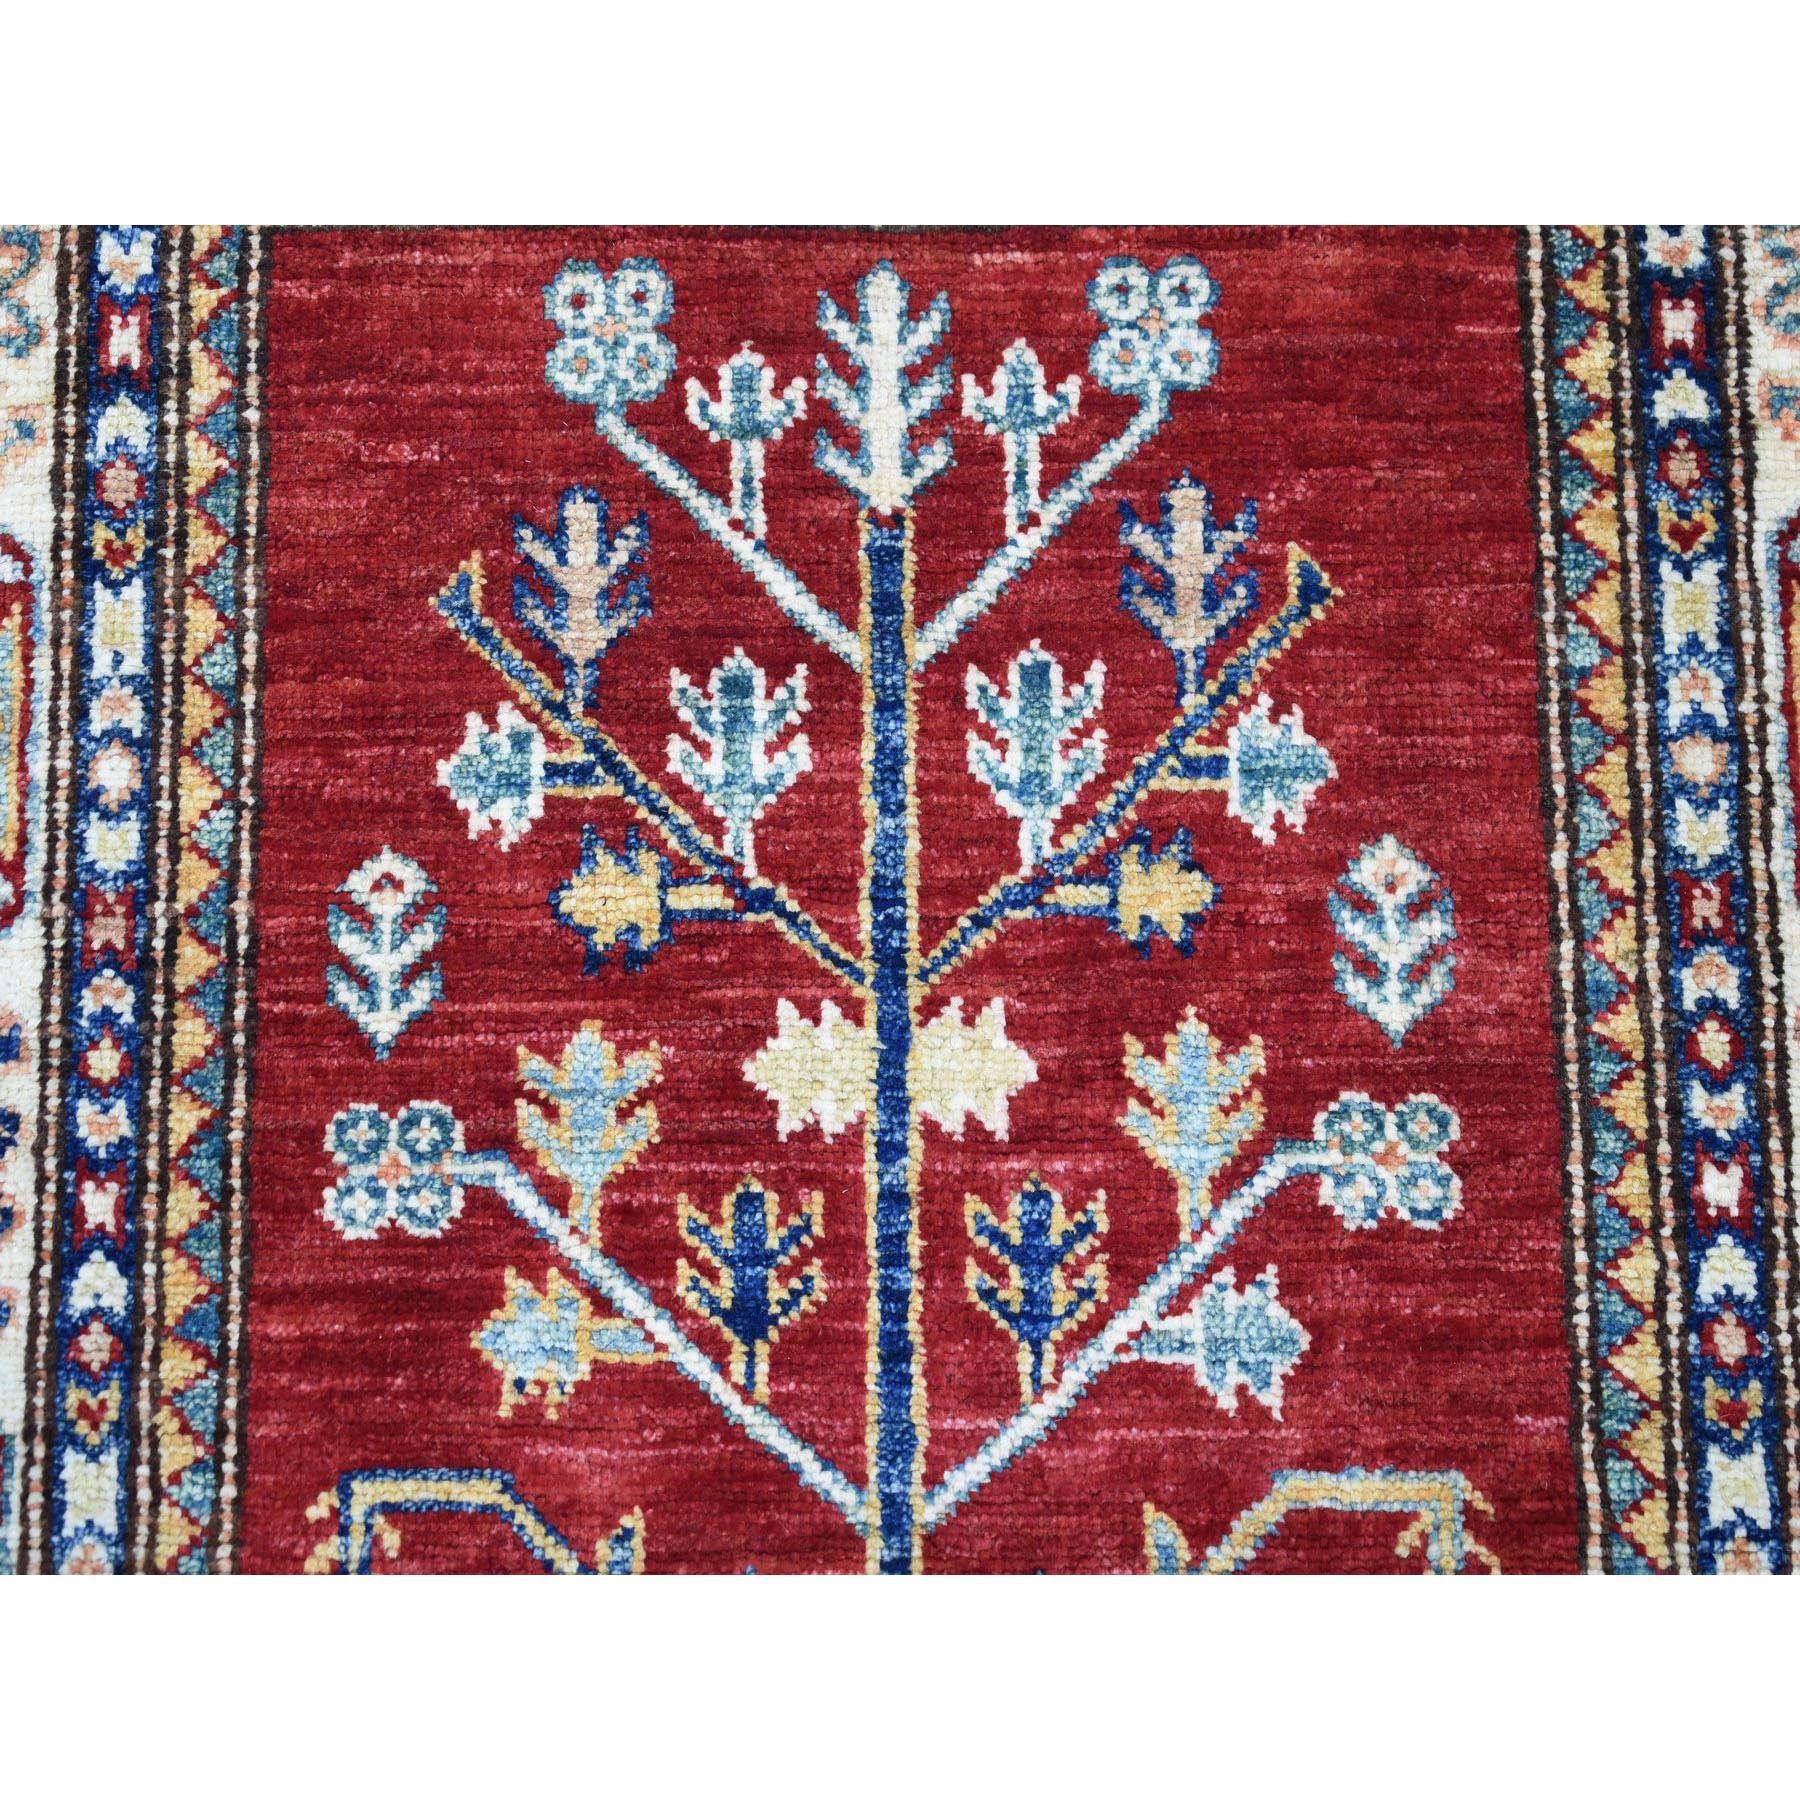 2-7 x4-6  Red Super Kazak Pure Wool Geometric Design Hand-Knotted Oriental Rug